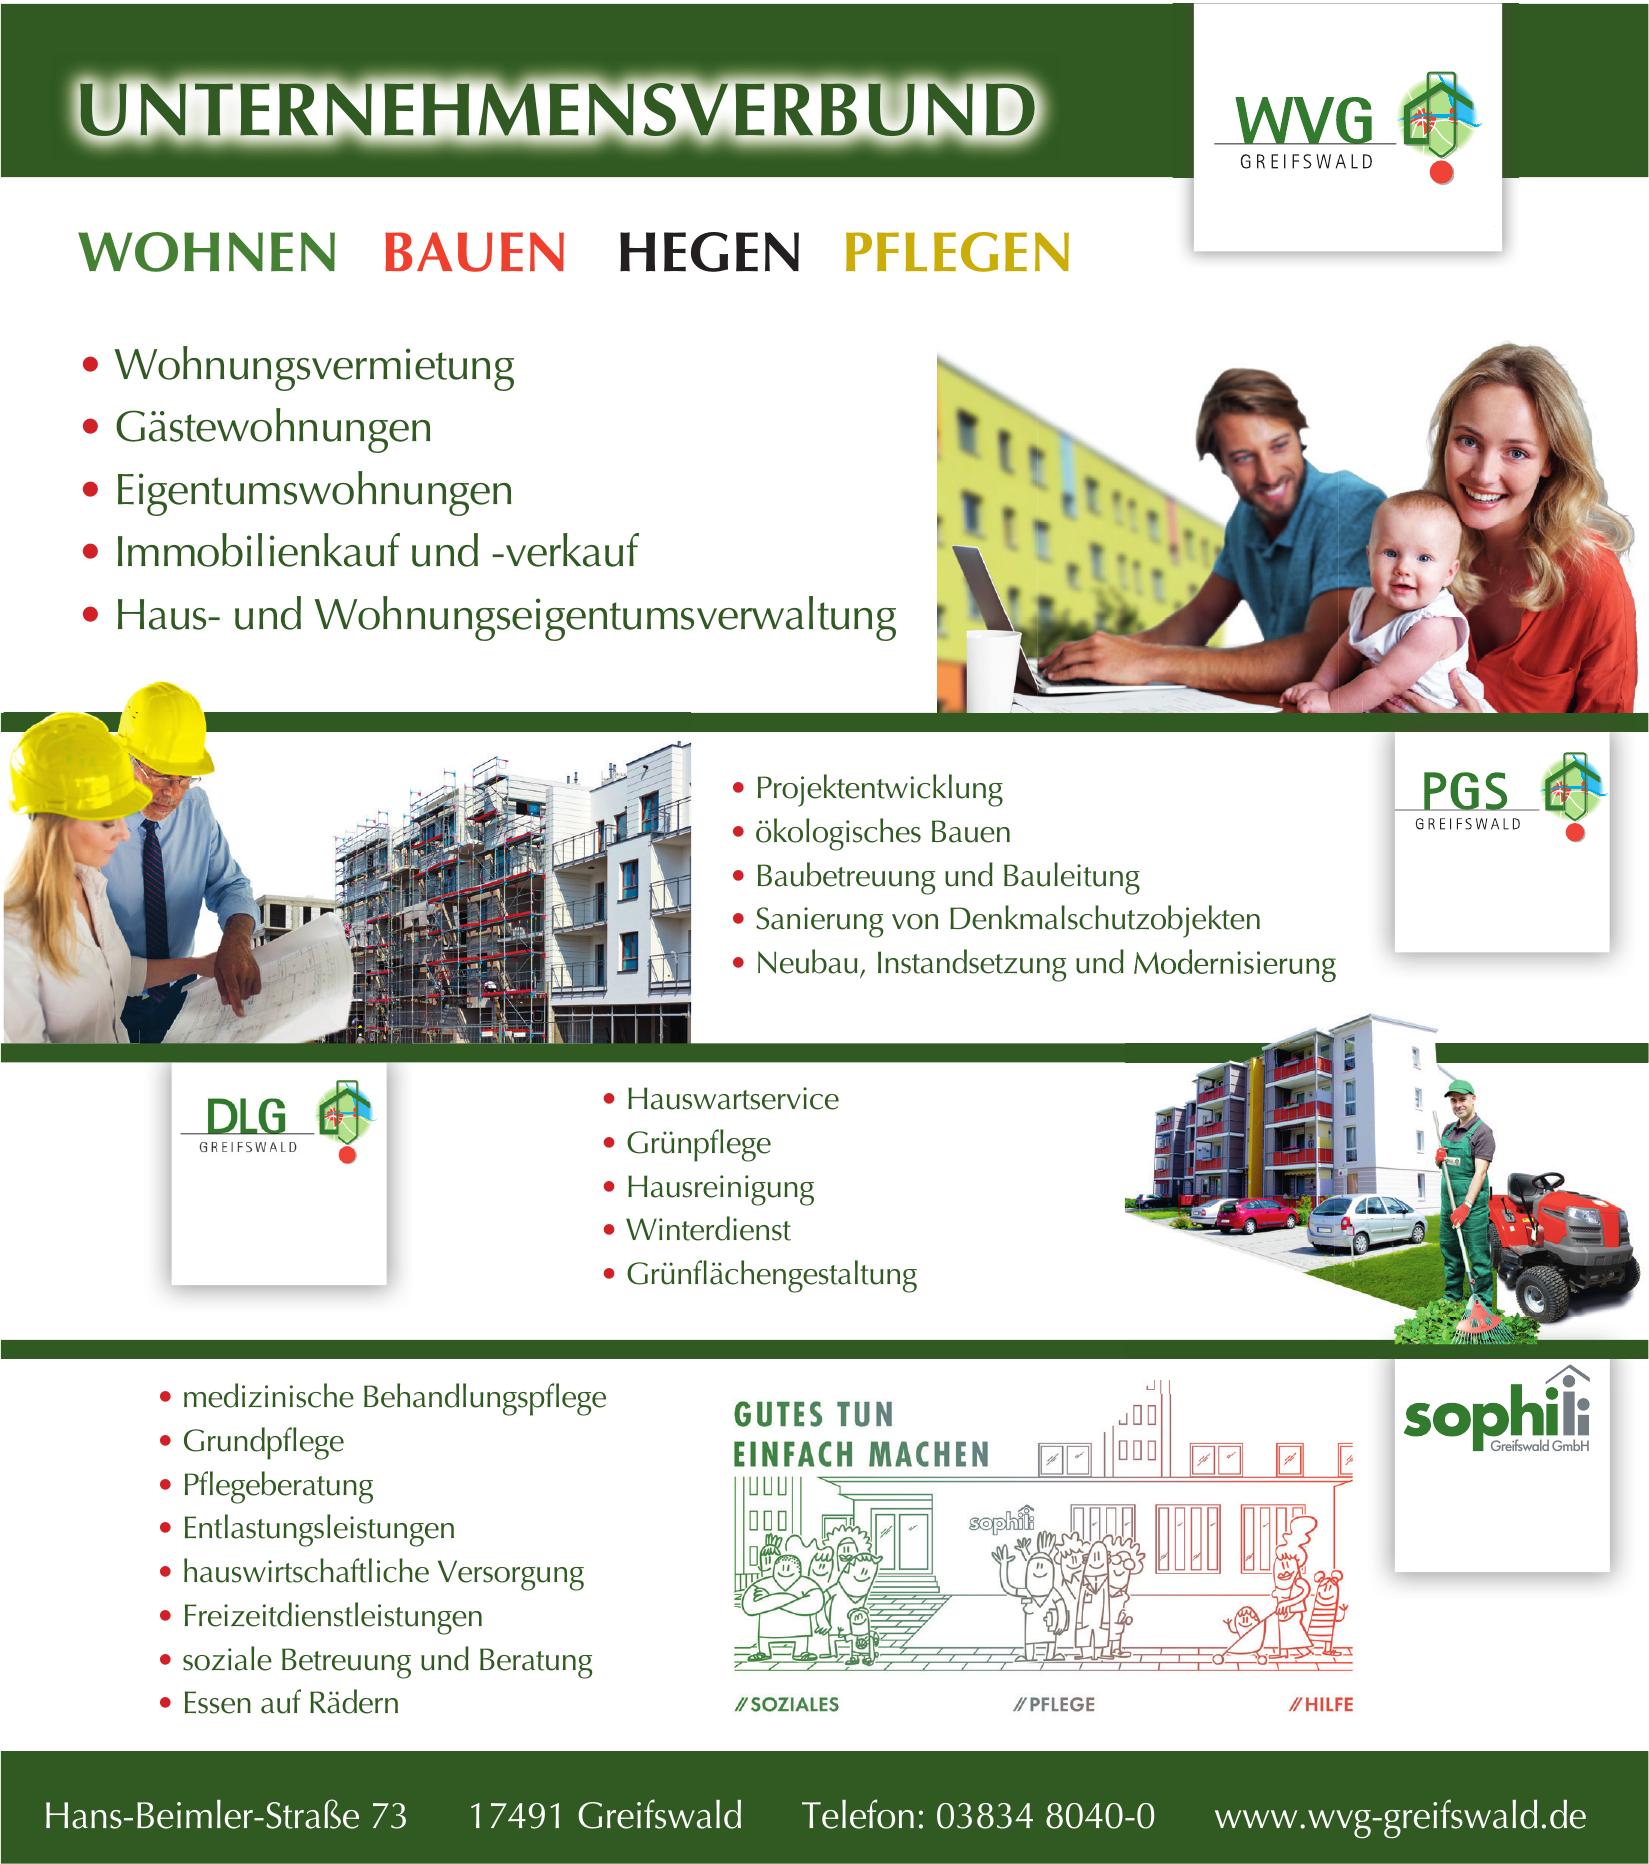 WVG Greifswald